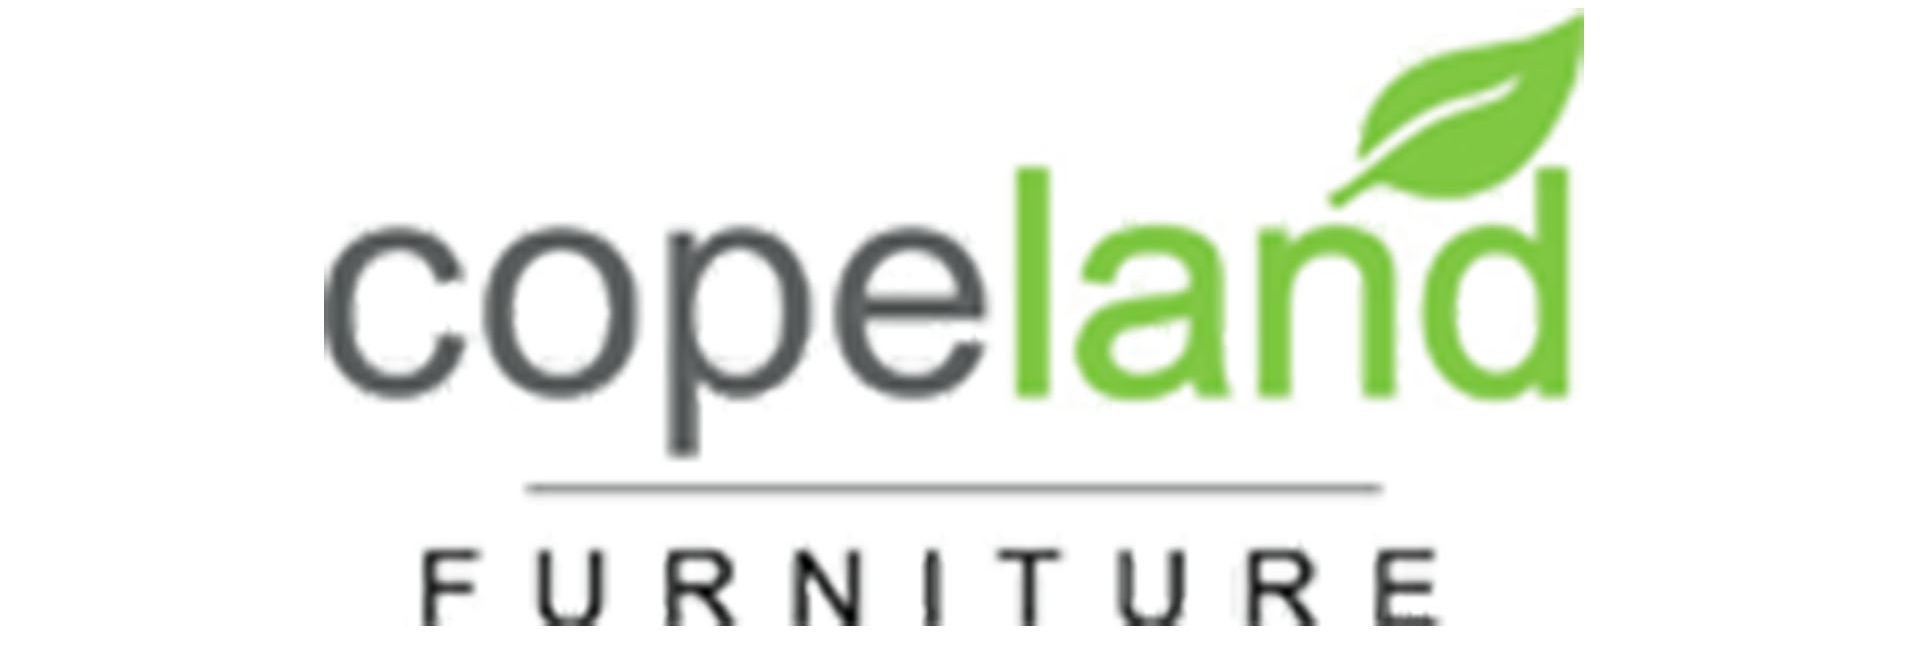 copeland+logo.jpg